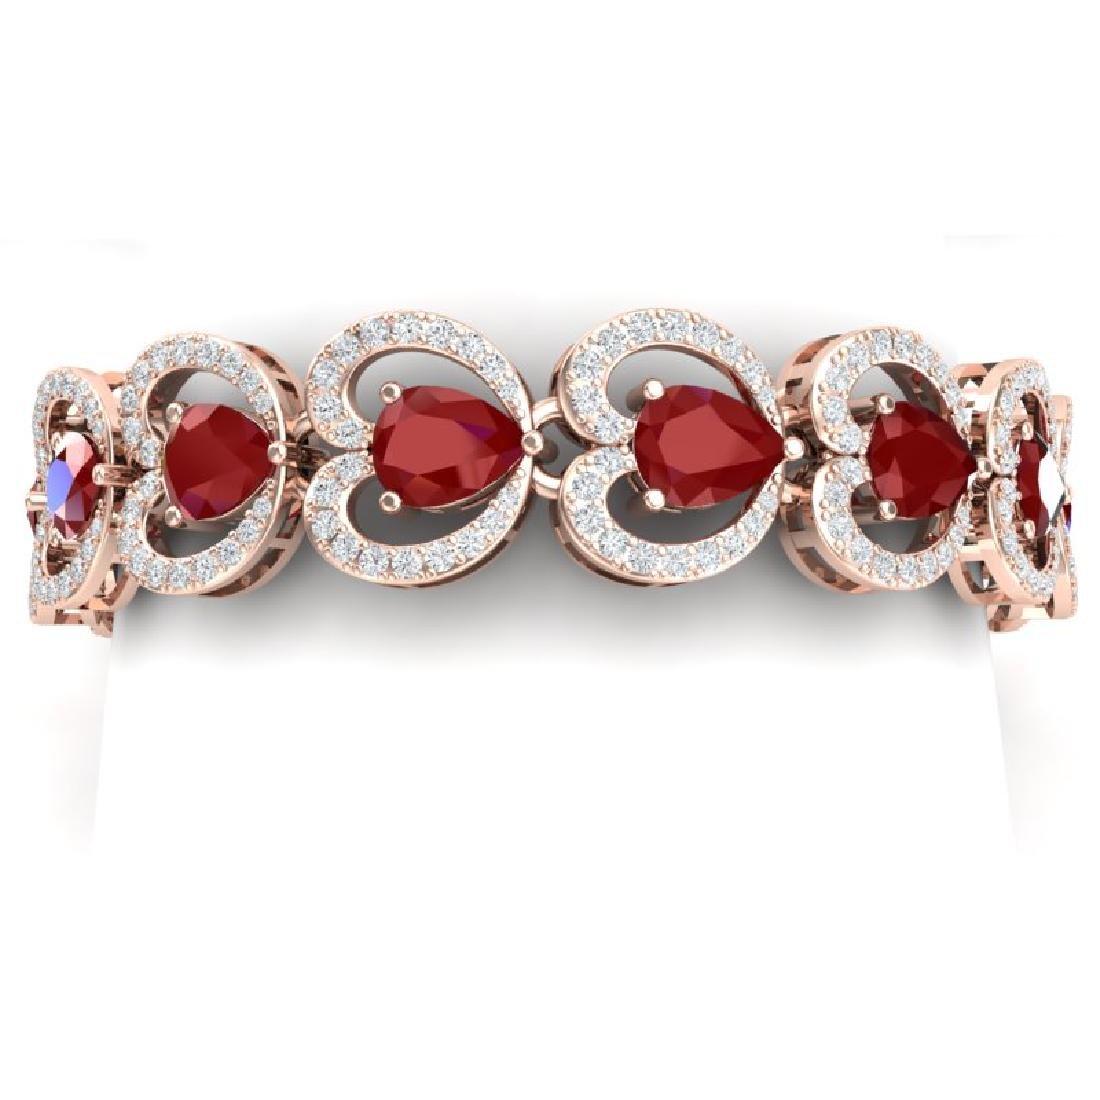 32.15 CTW Royalty Ruby & VS Diamond Bracelet 18K Rose